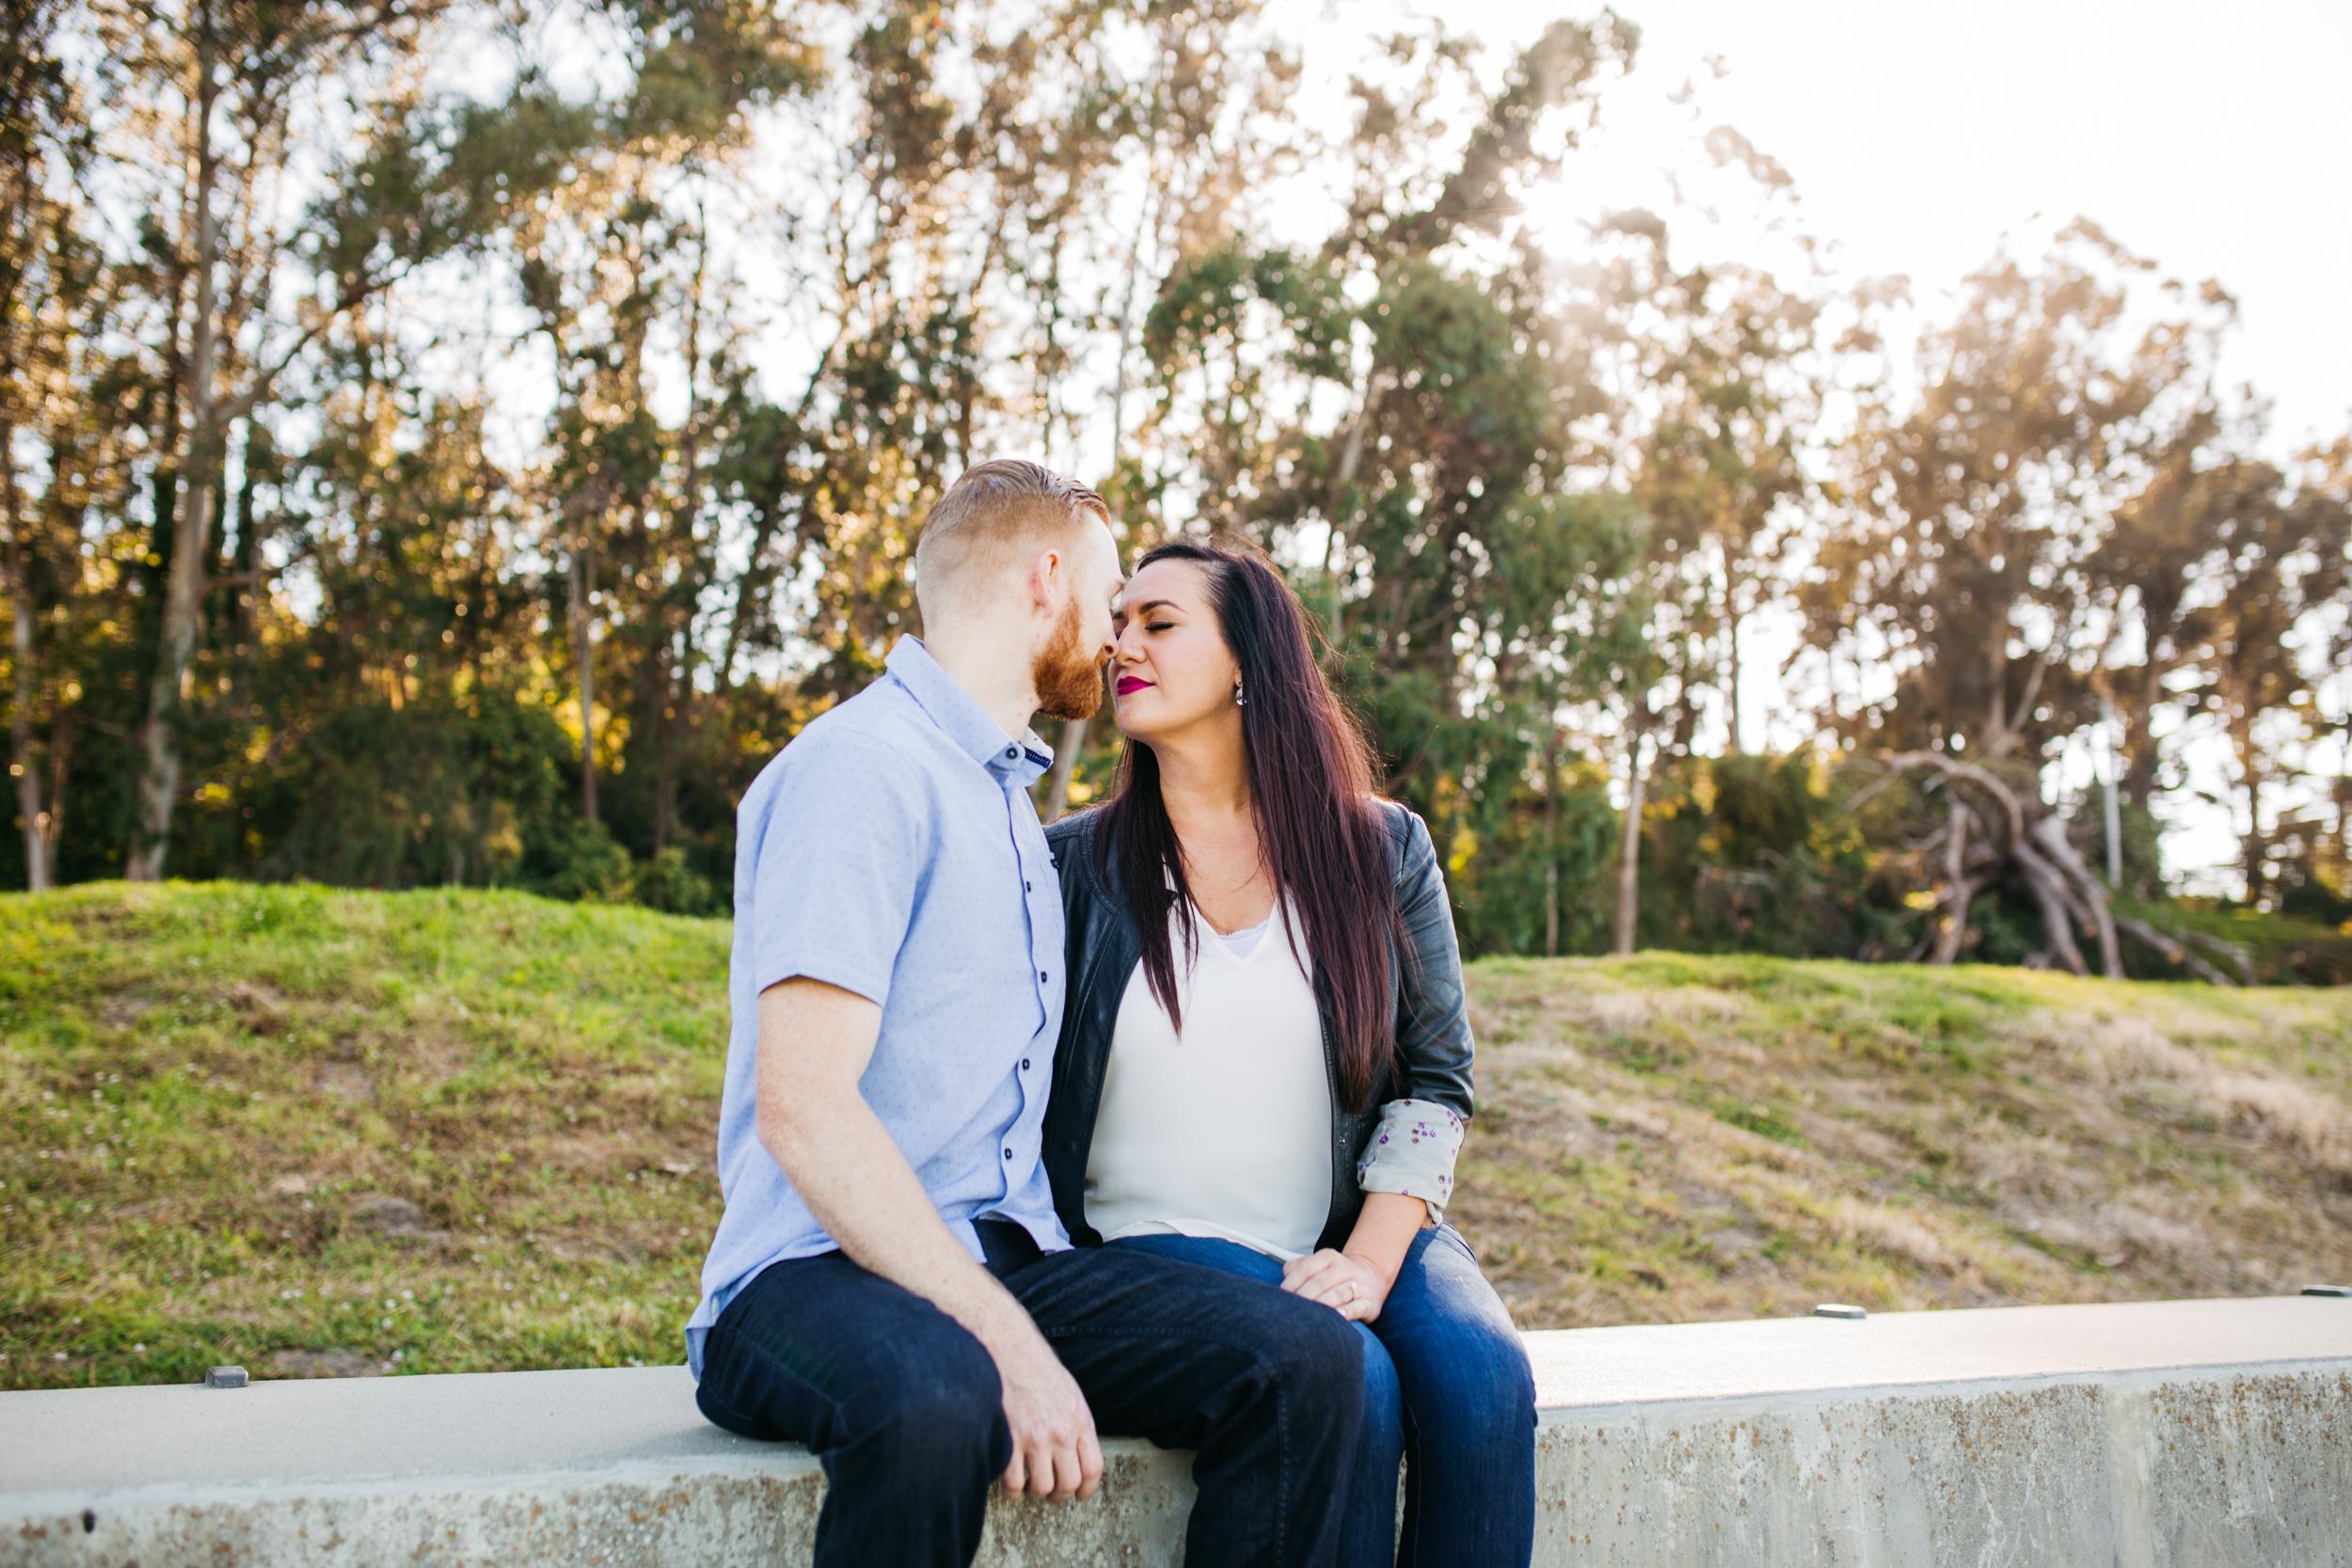 Engagement Photos-San Fransisco-Golden Gate Park-Ranalla Photo & Films-4.jpg